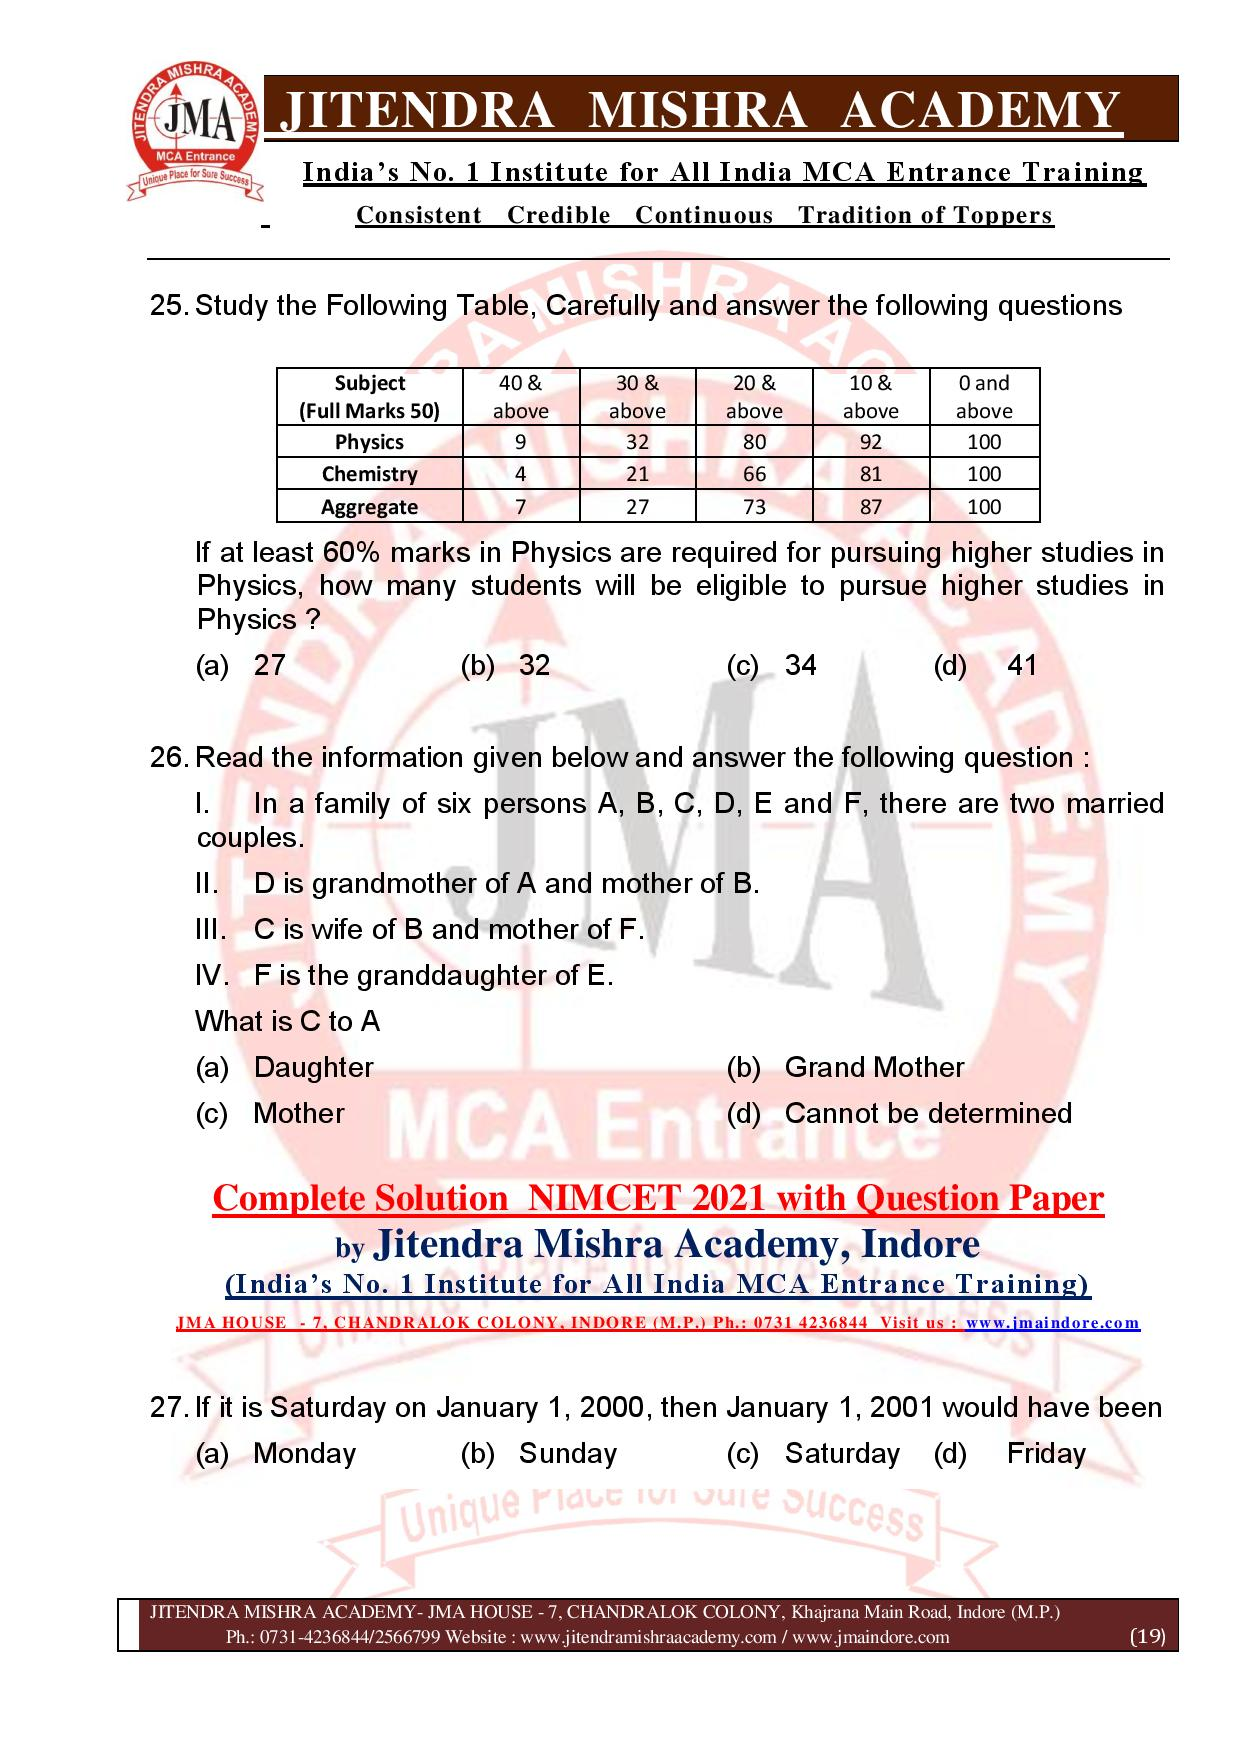 NIMCET 2021 QUESTION PAPER (F)-page-019